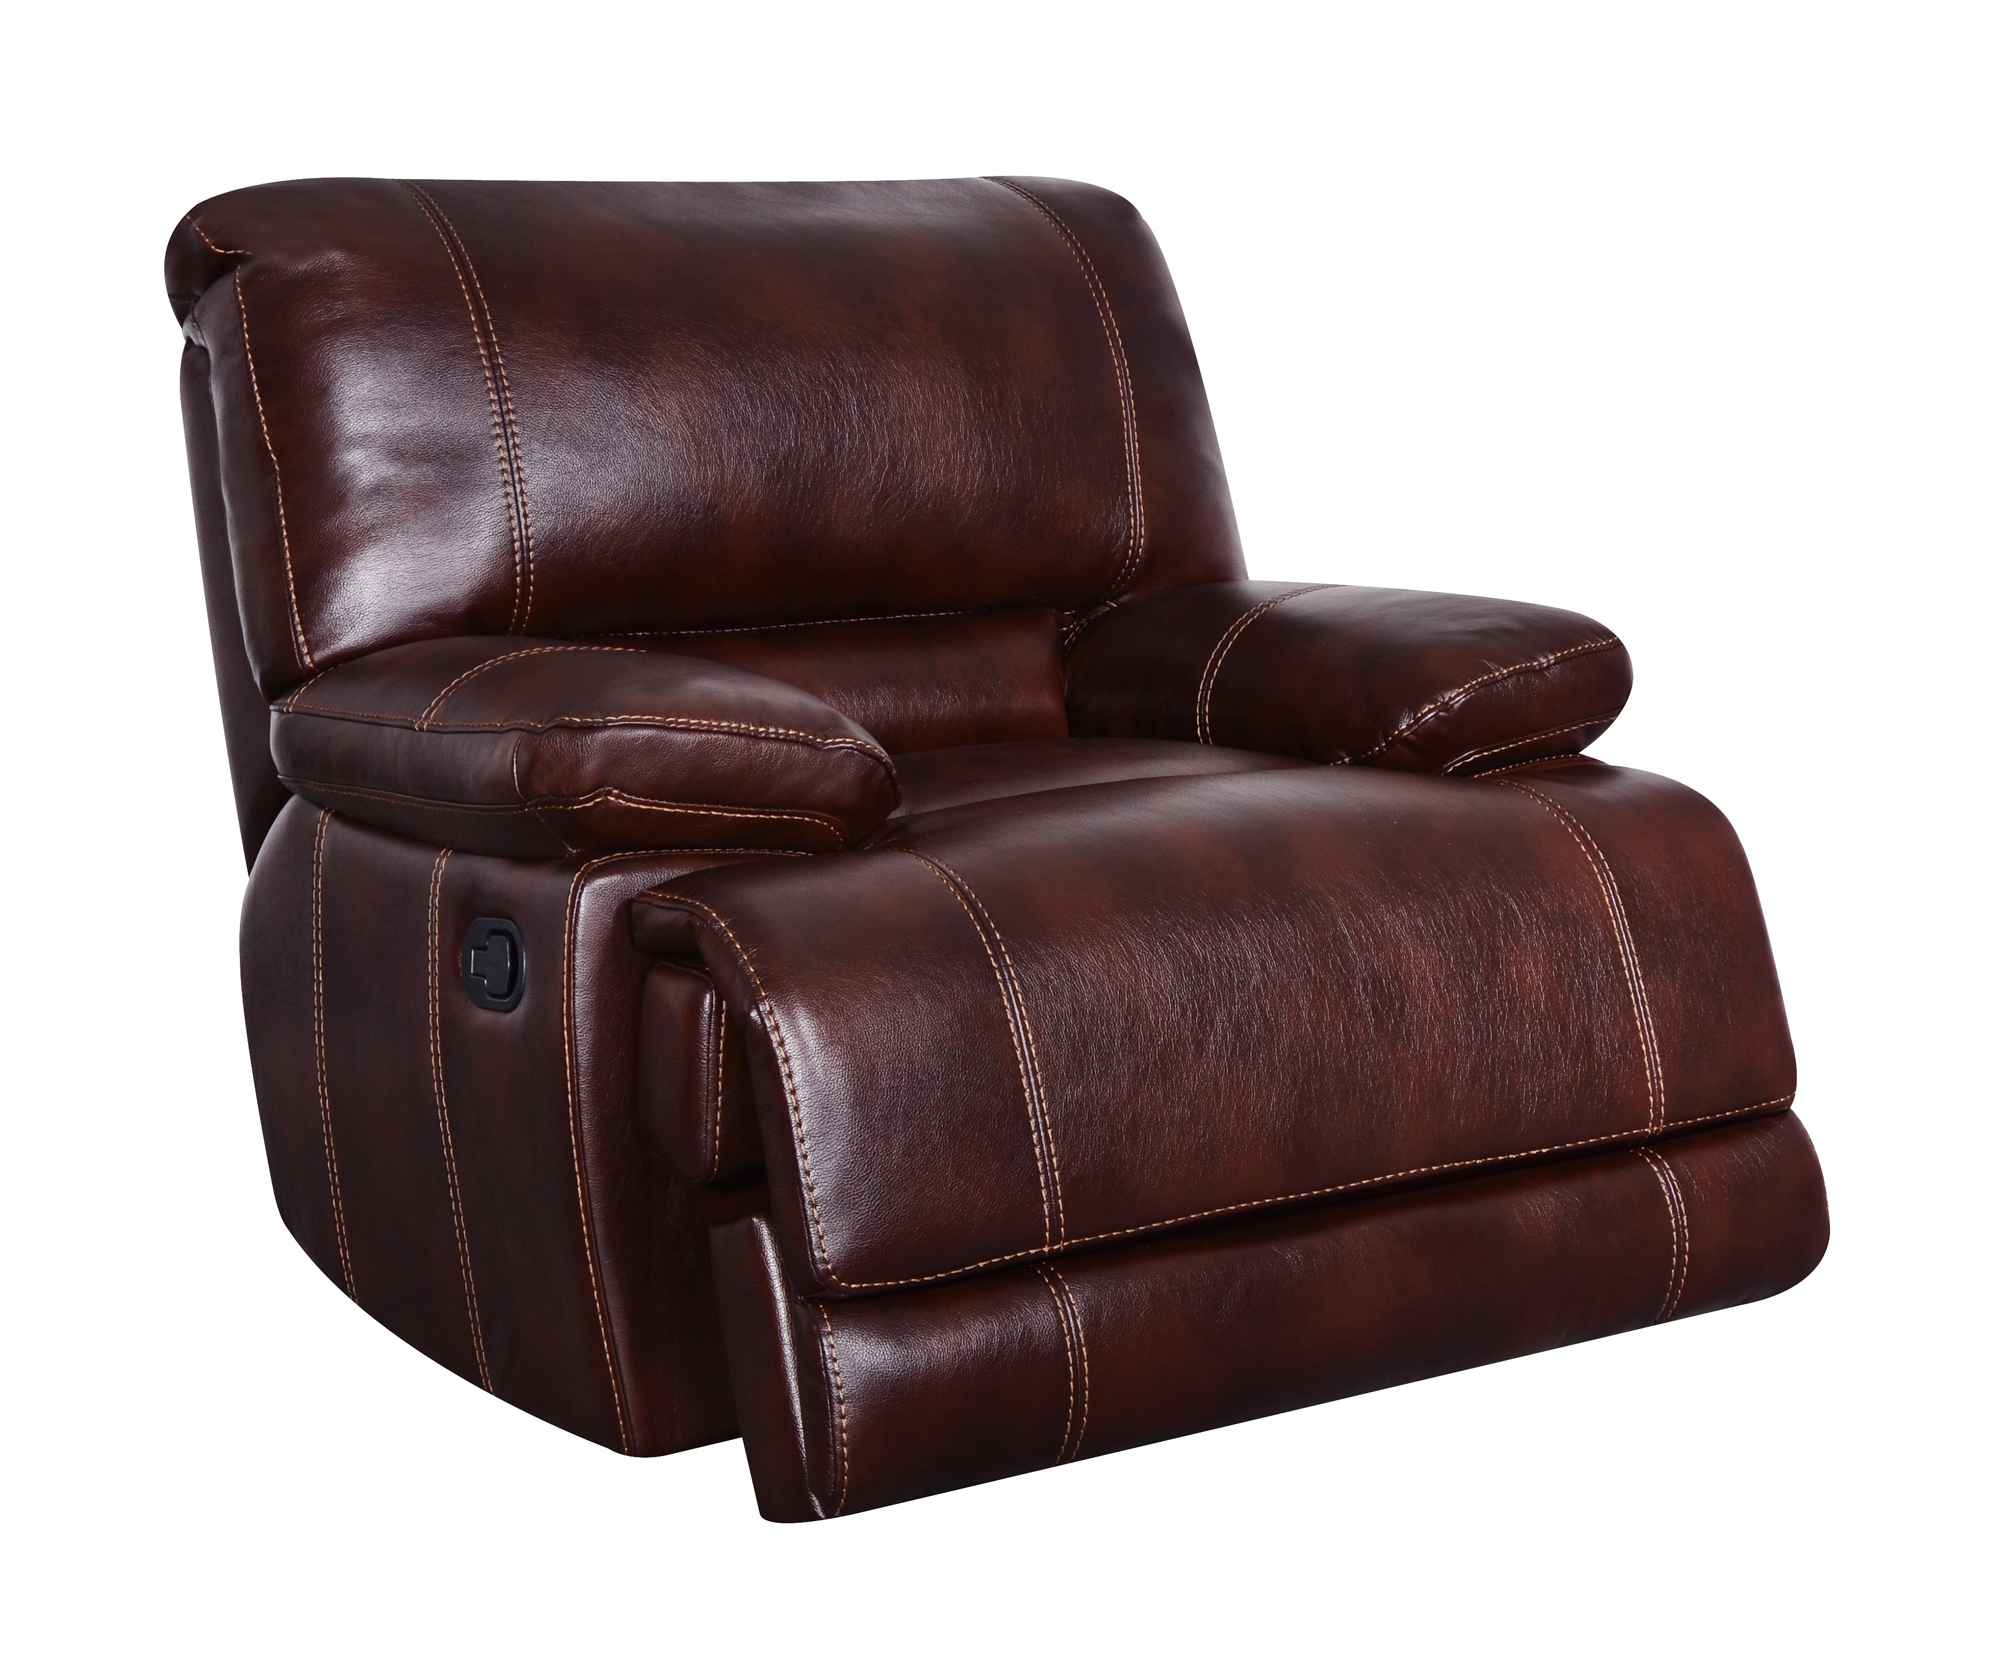 U1953 Coffee Leather Gel Glider Reclining Chair By Global Furniture